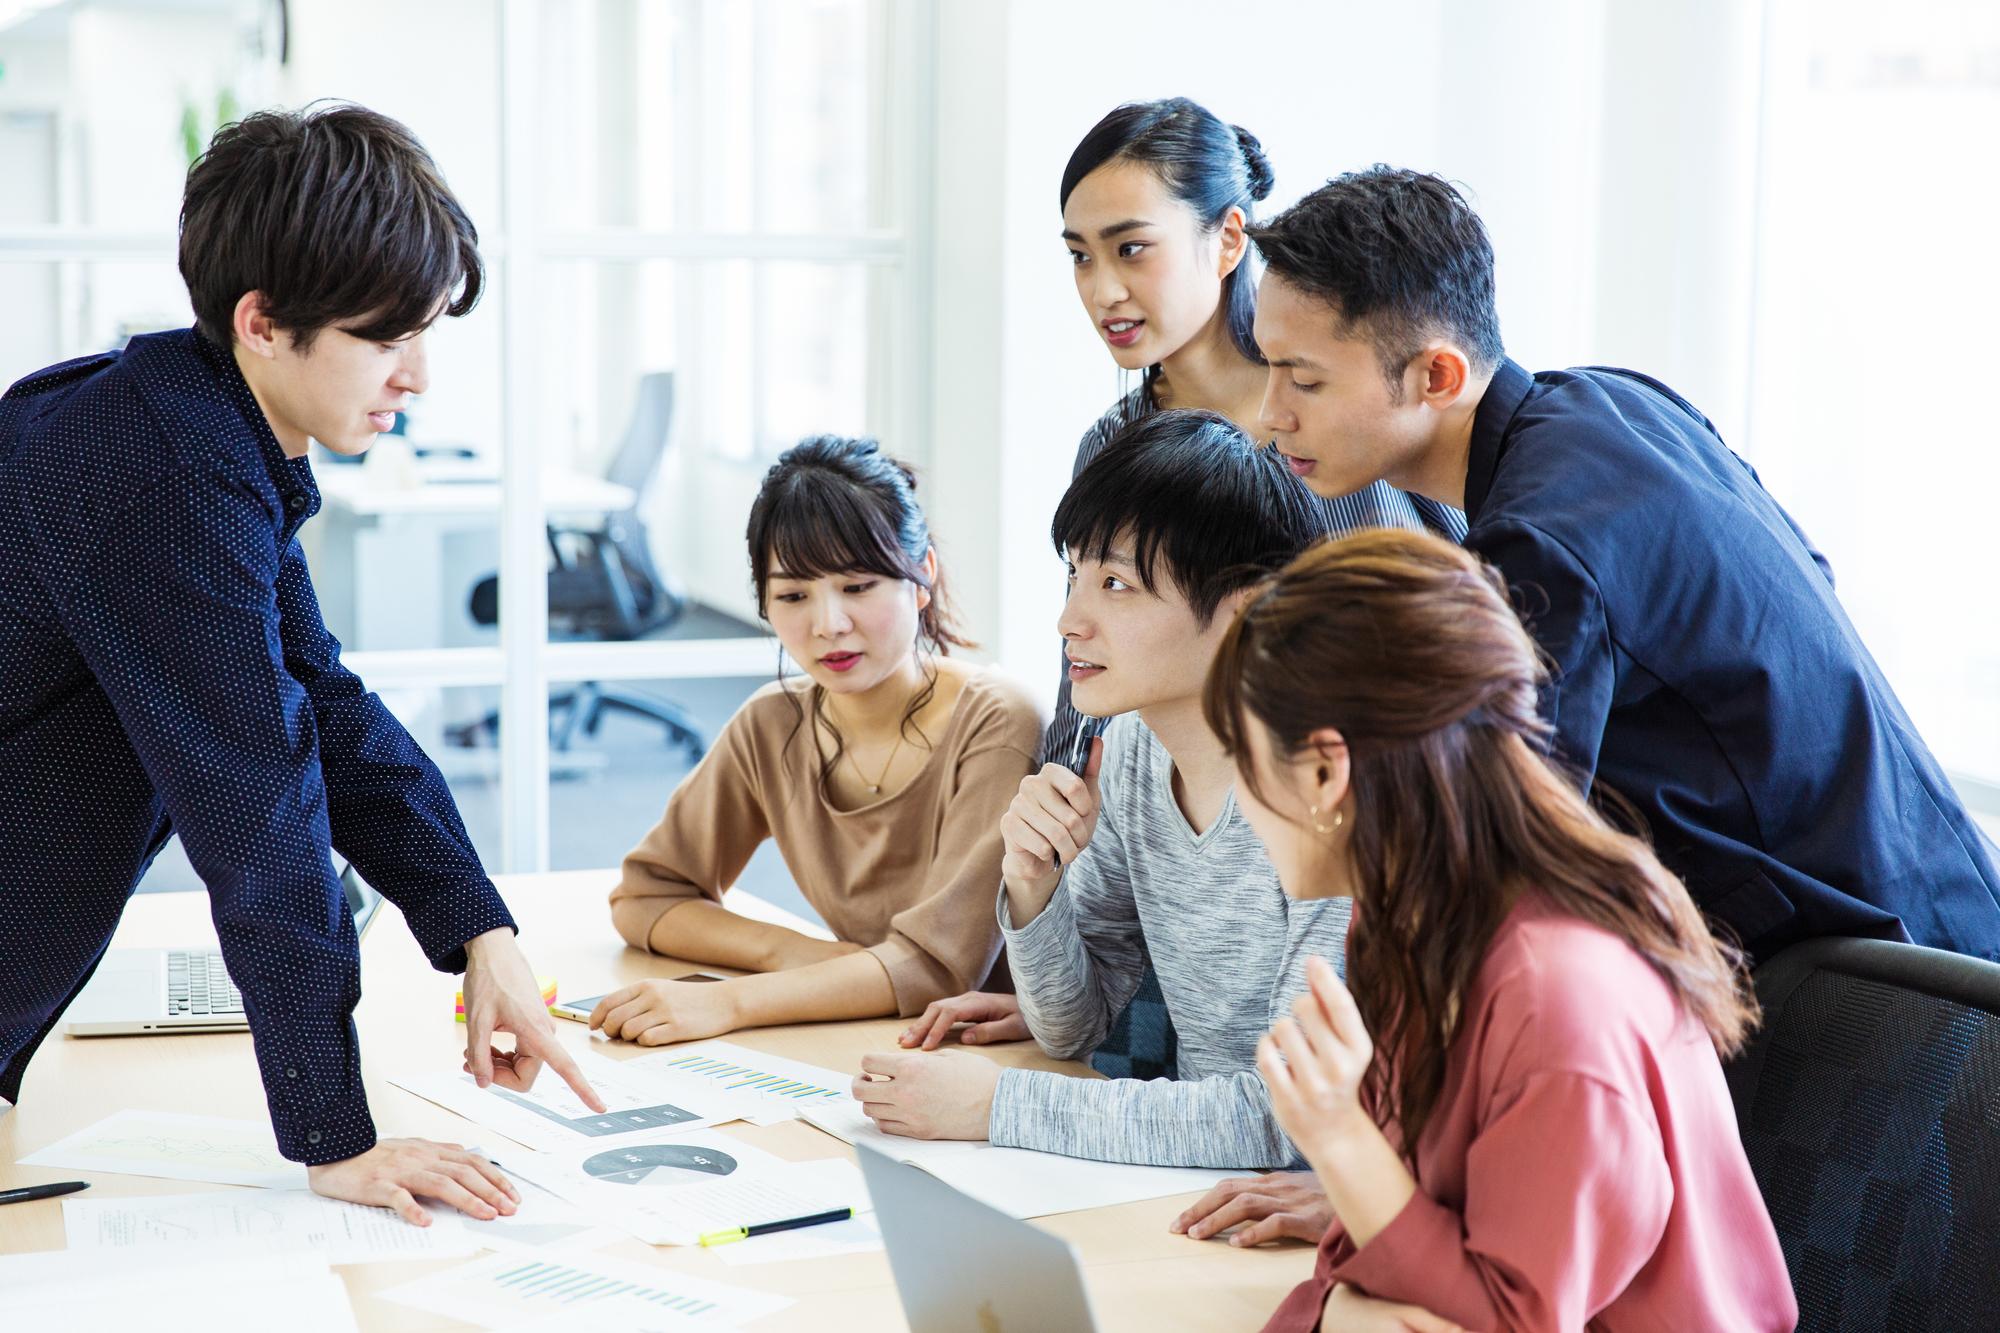 IT企業の外資系転職における要点5つ